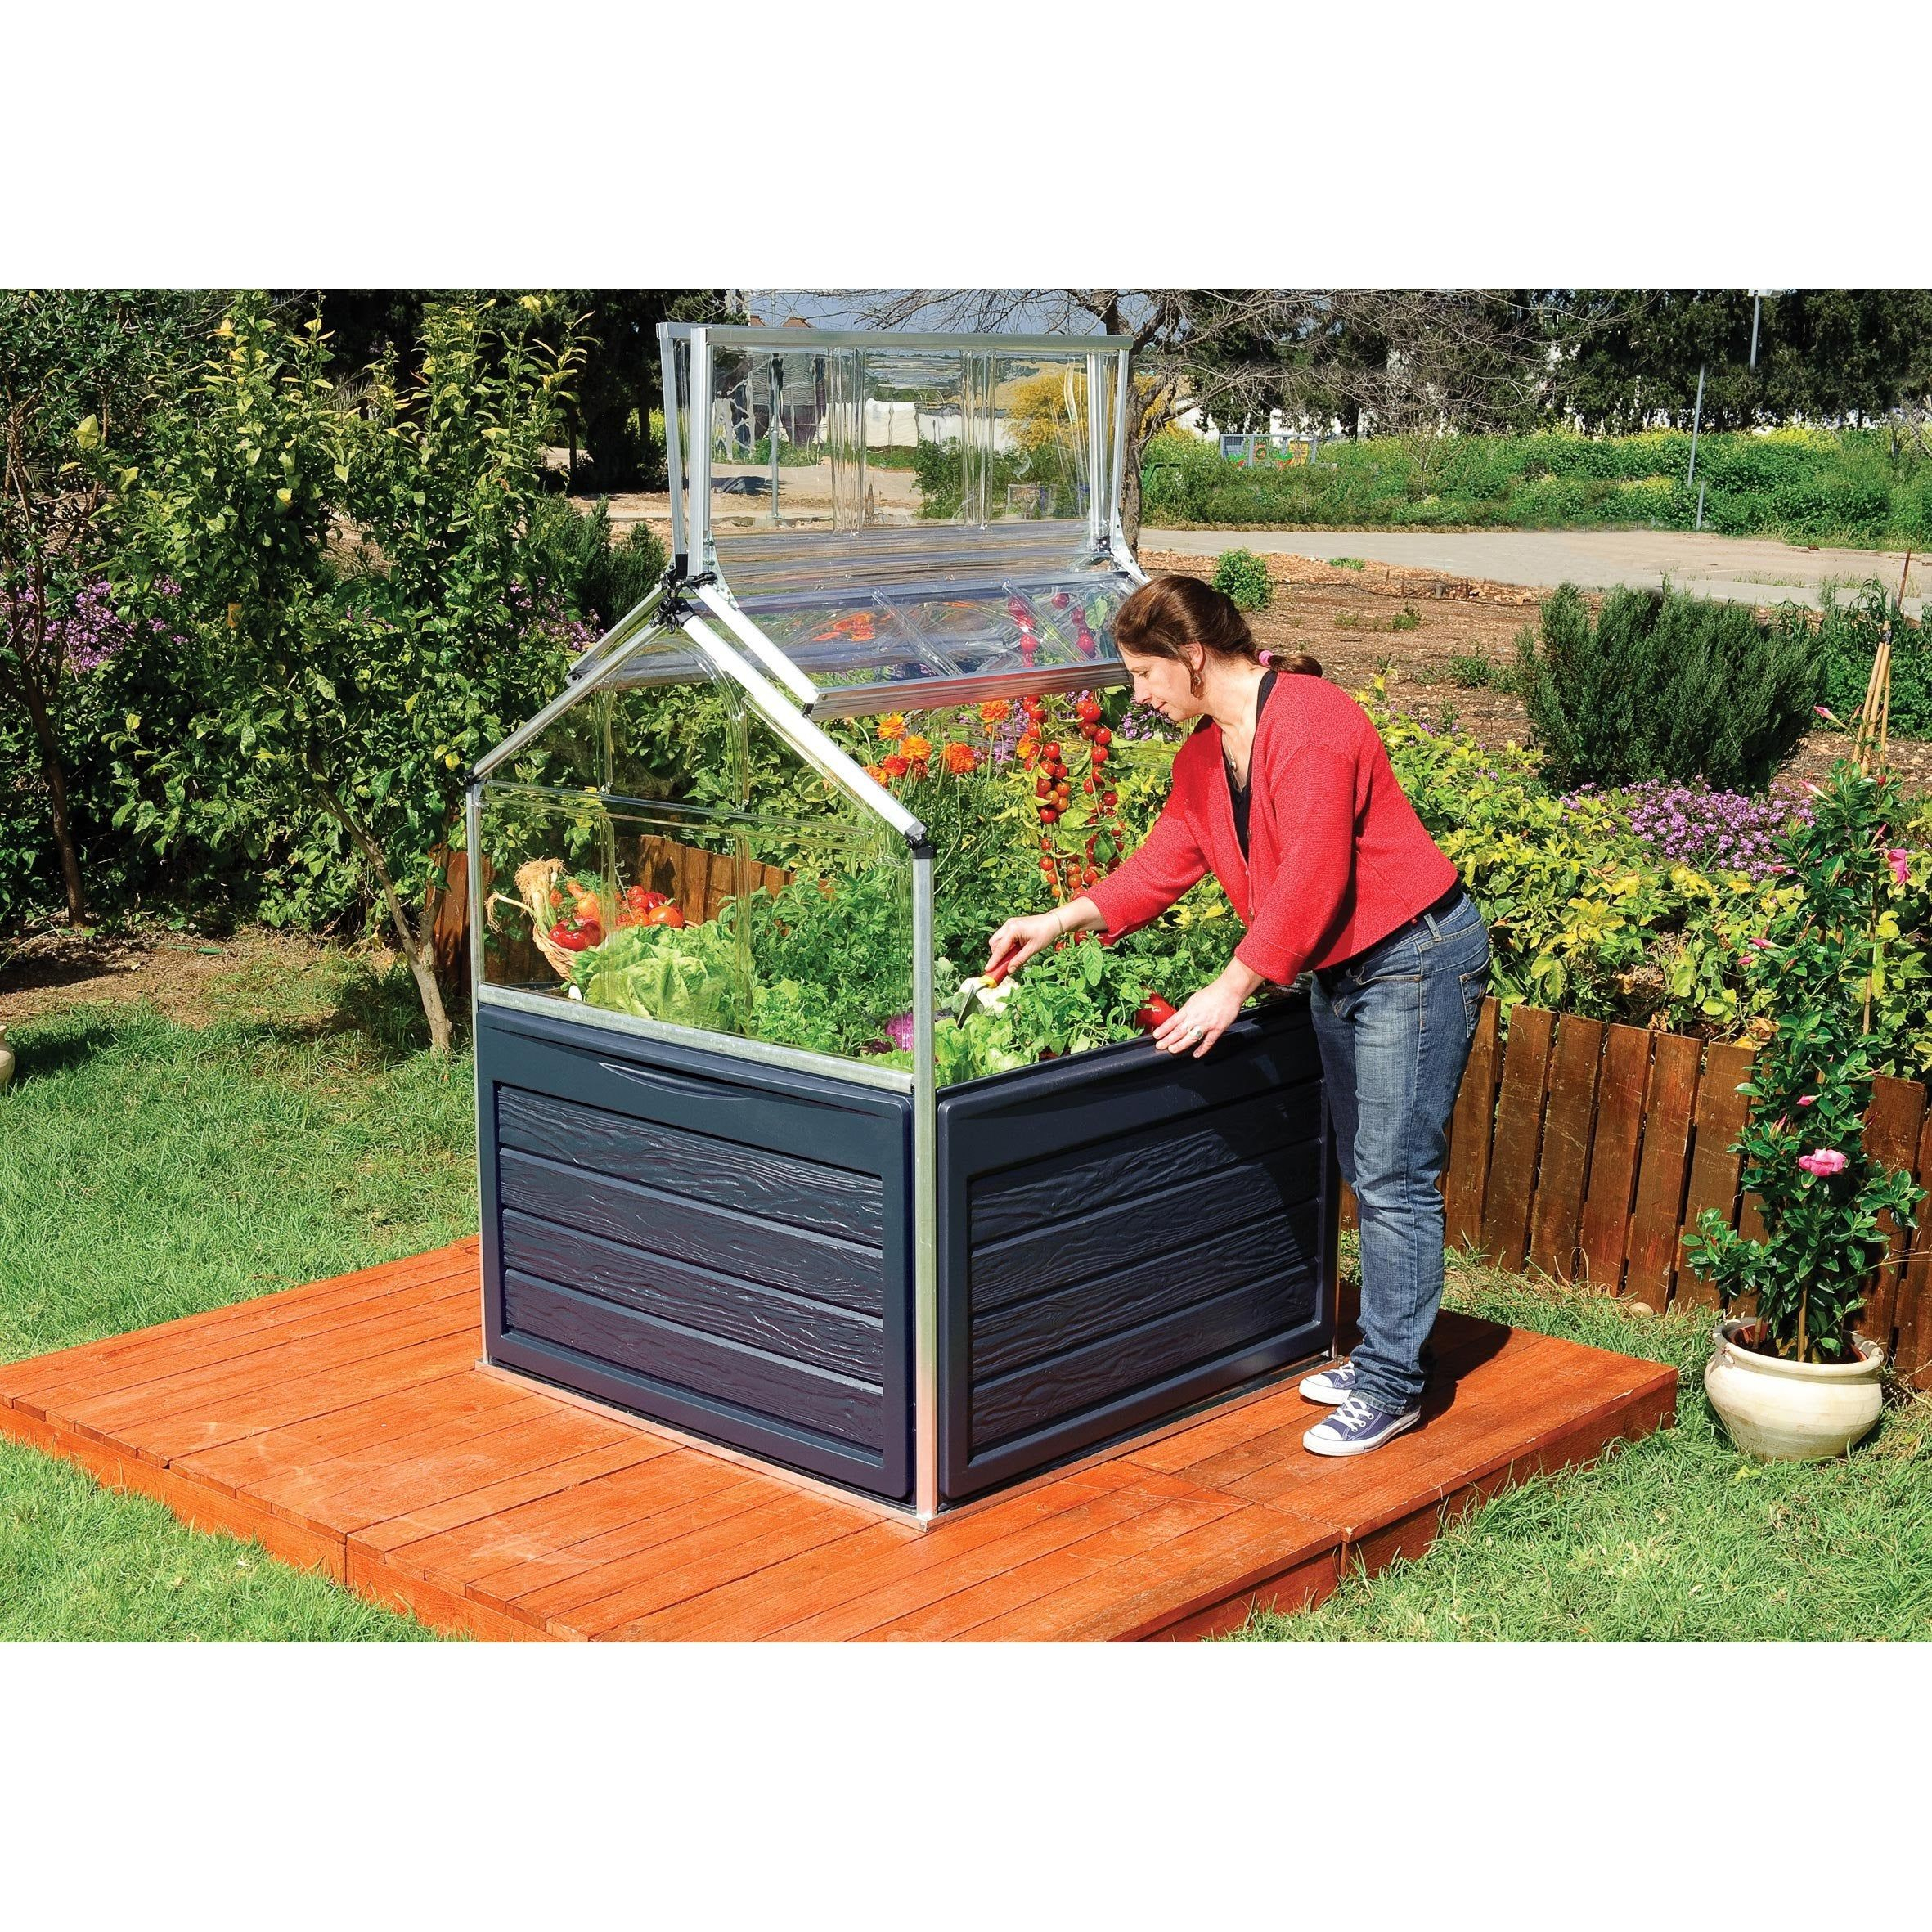 Mini Serre De Jardin Carré Potager Plant Inn 1.4 M² Palram ... tout Mini Serre De Jardin Pas Cher